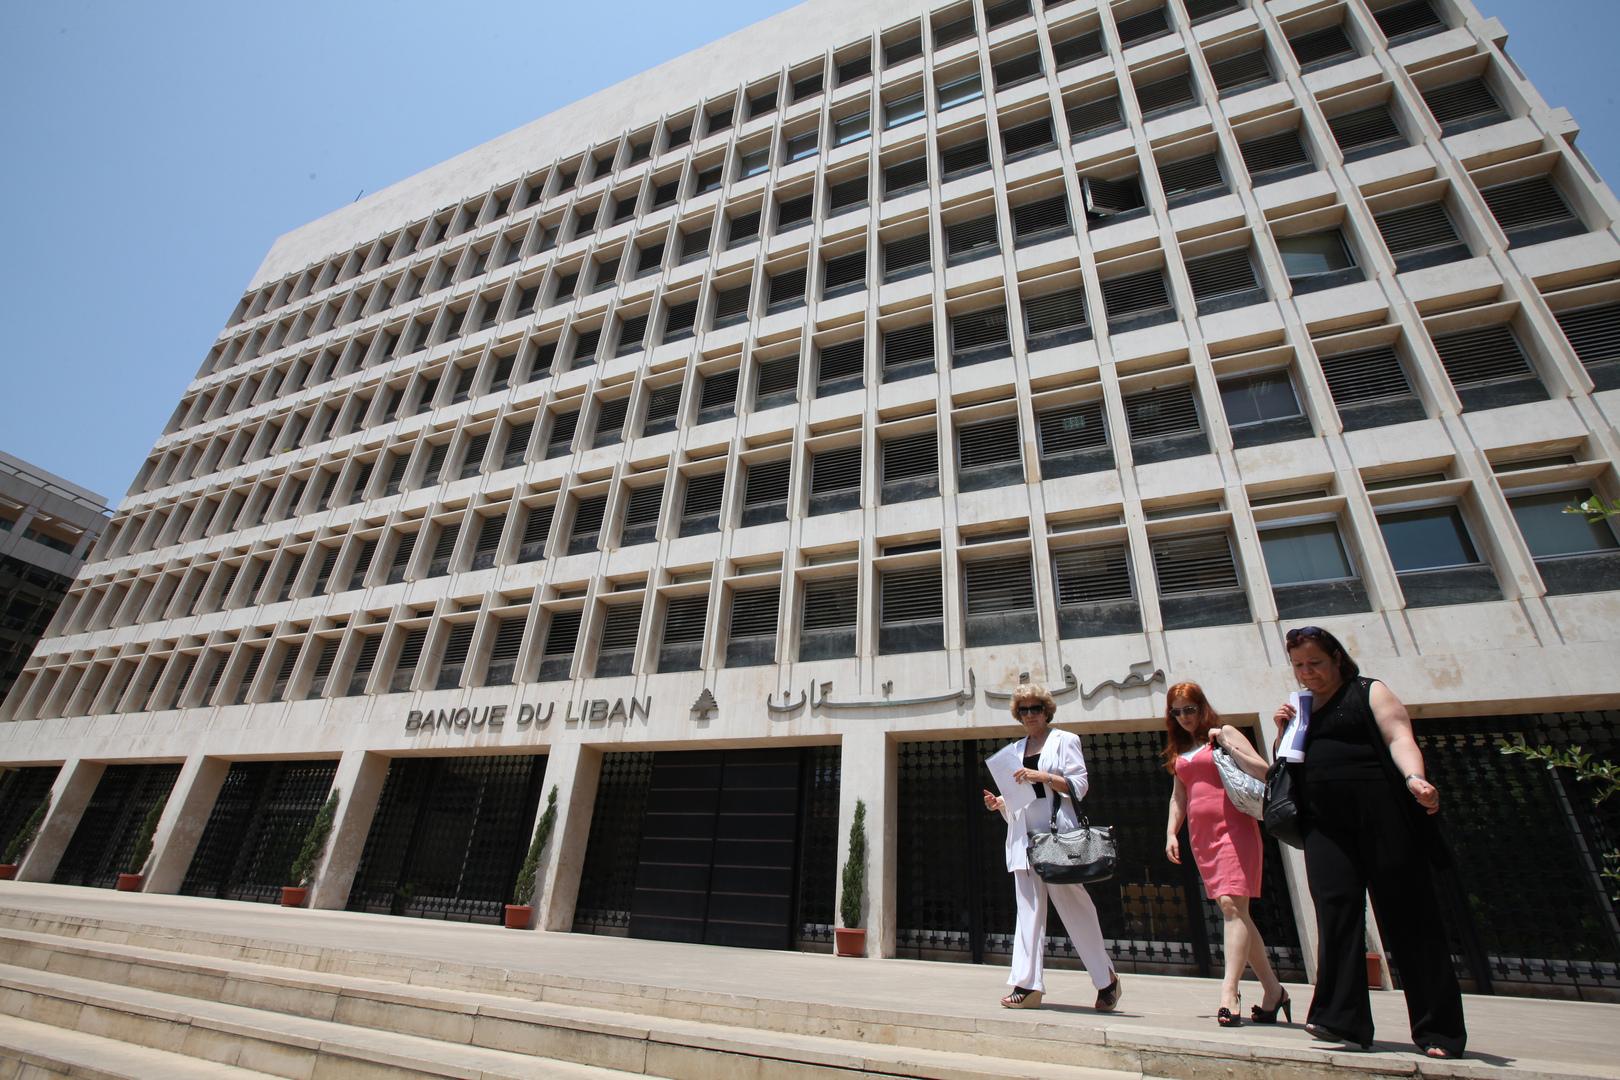 مصرف لبنان يعلن عقد اجتماع إيجابي مع صندوق النقد